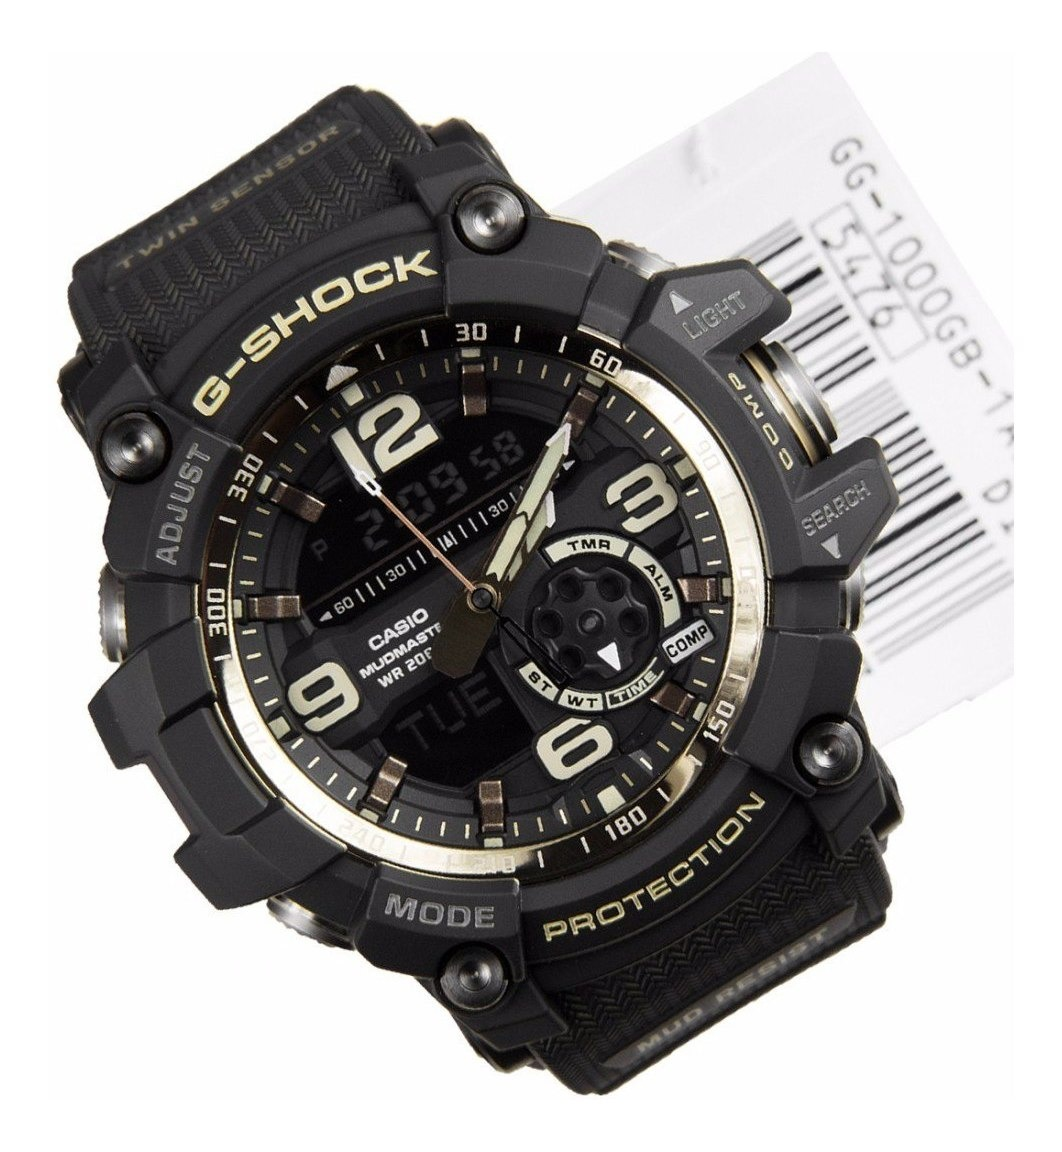 Local G Gg Casio Mudmaster Reloj Shock 1000gb 1a Belgrano mv8n0NwO